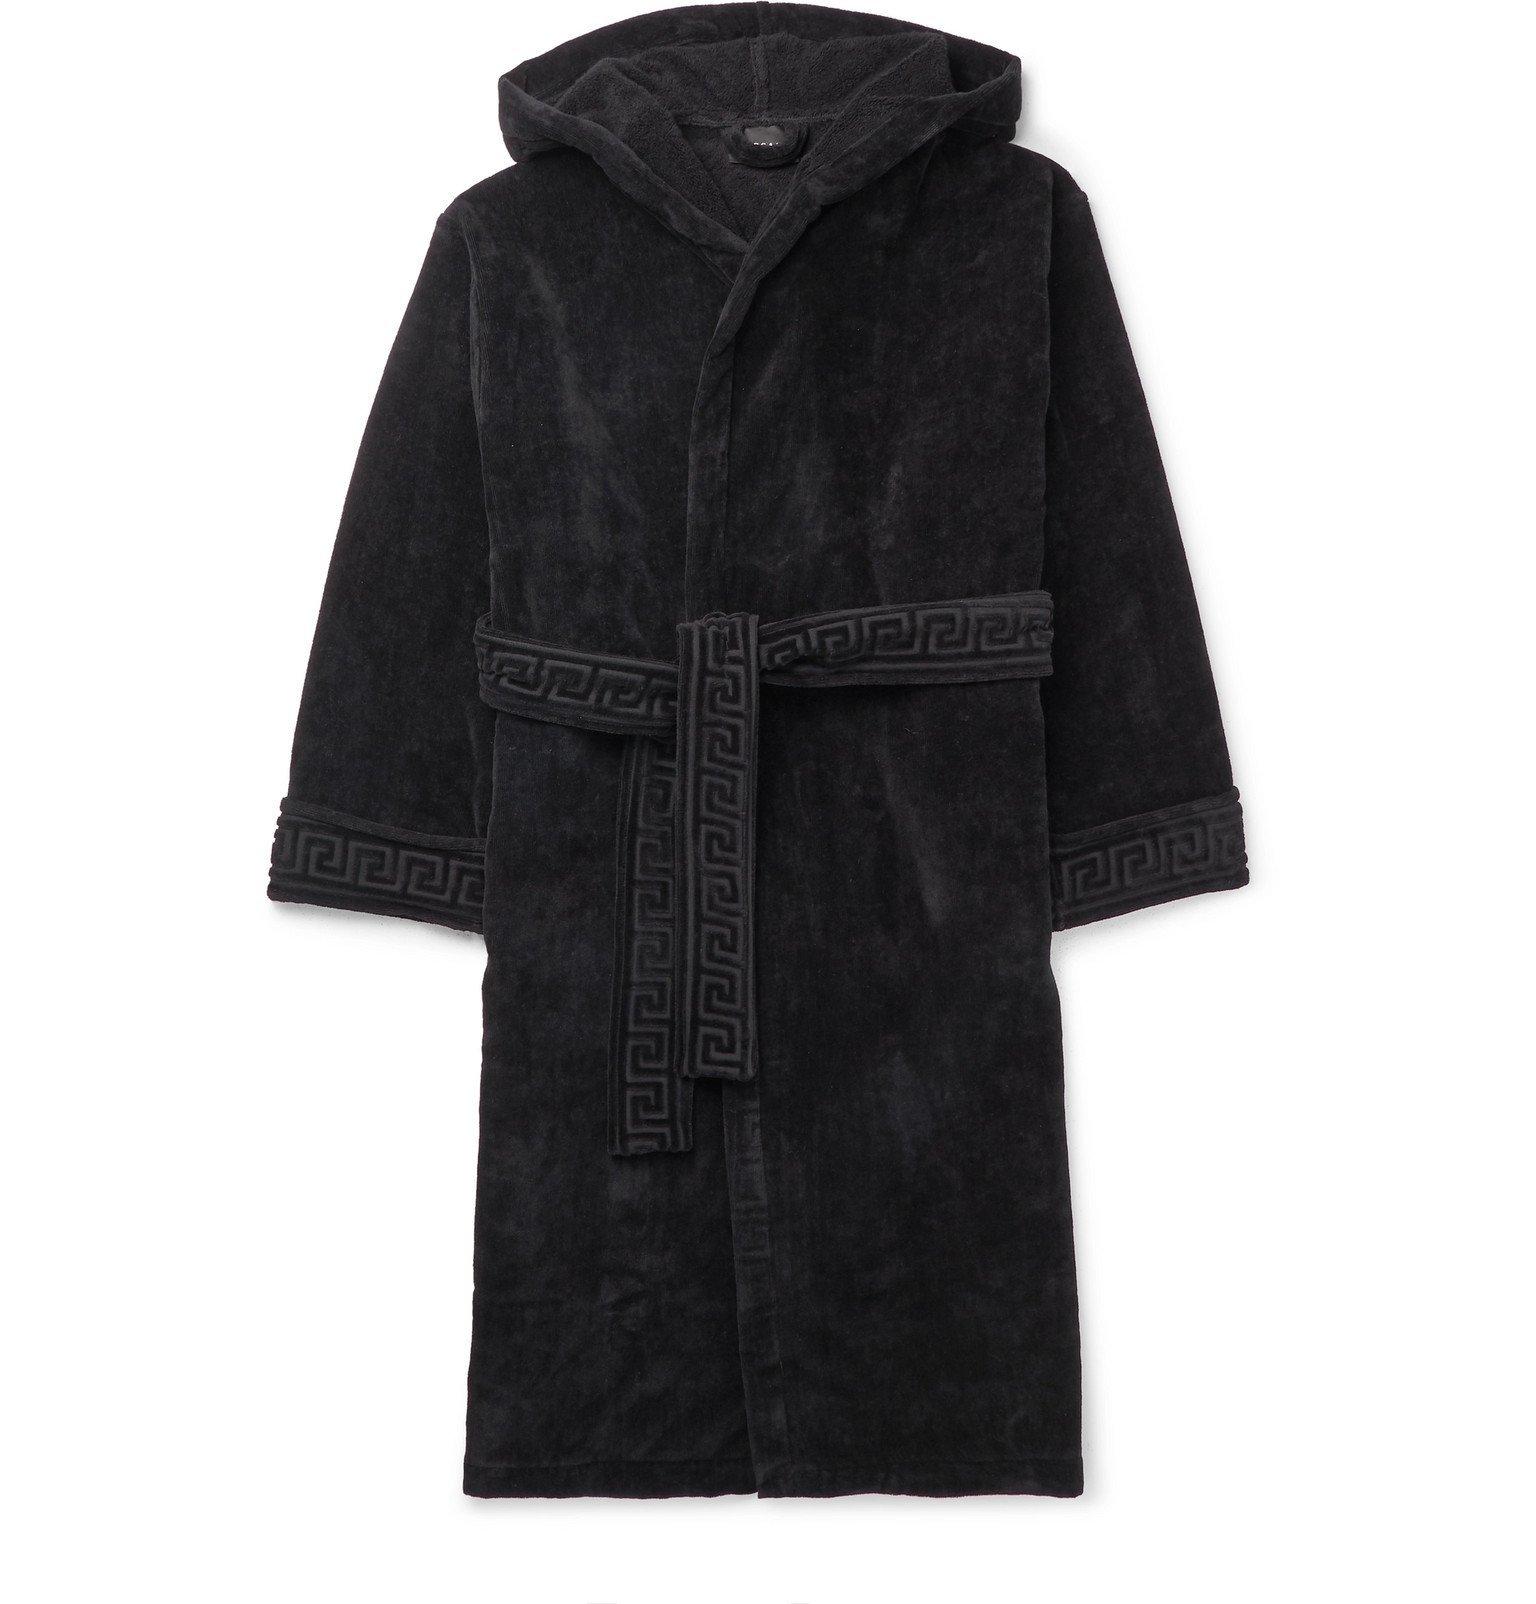 Versace - Logo-Jacquard Cotton-Terry Hooded Robe - Black